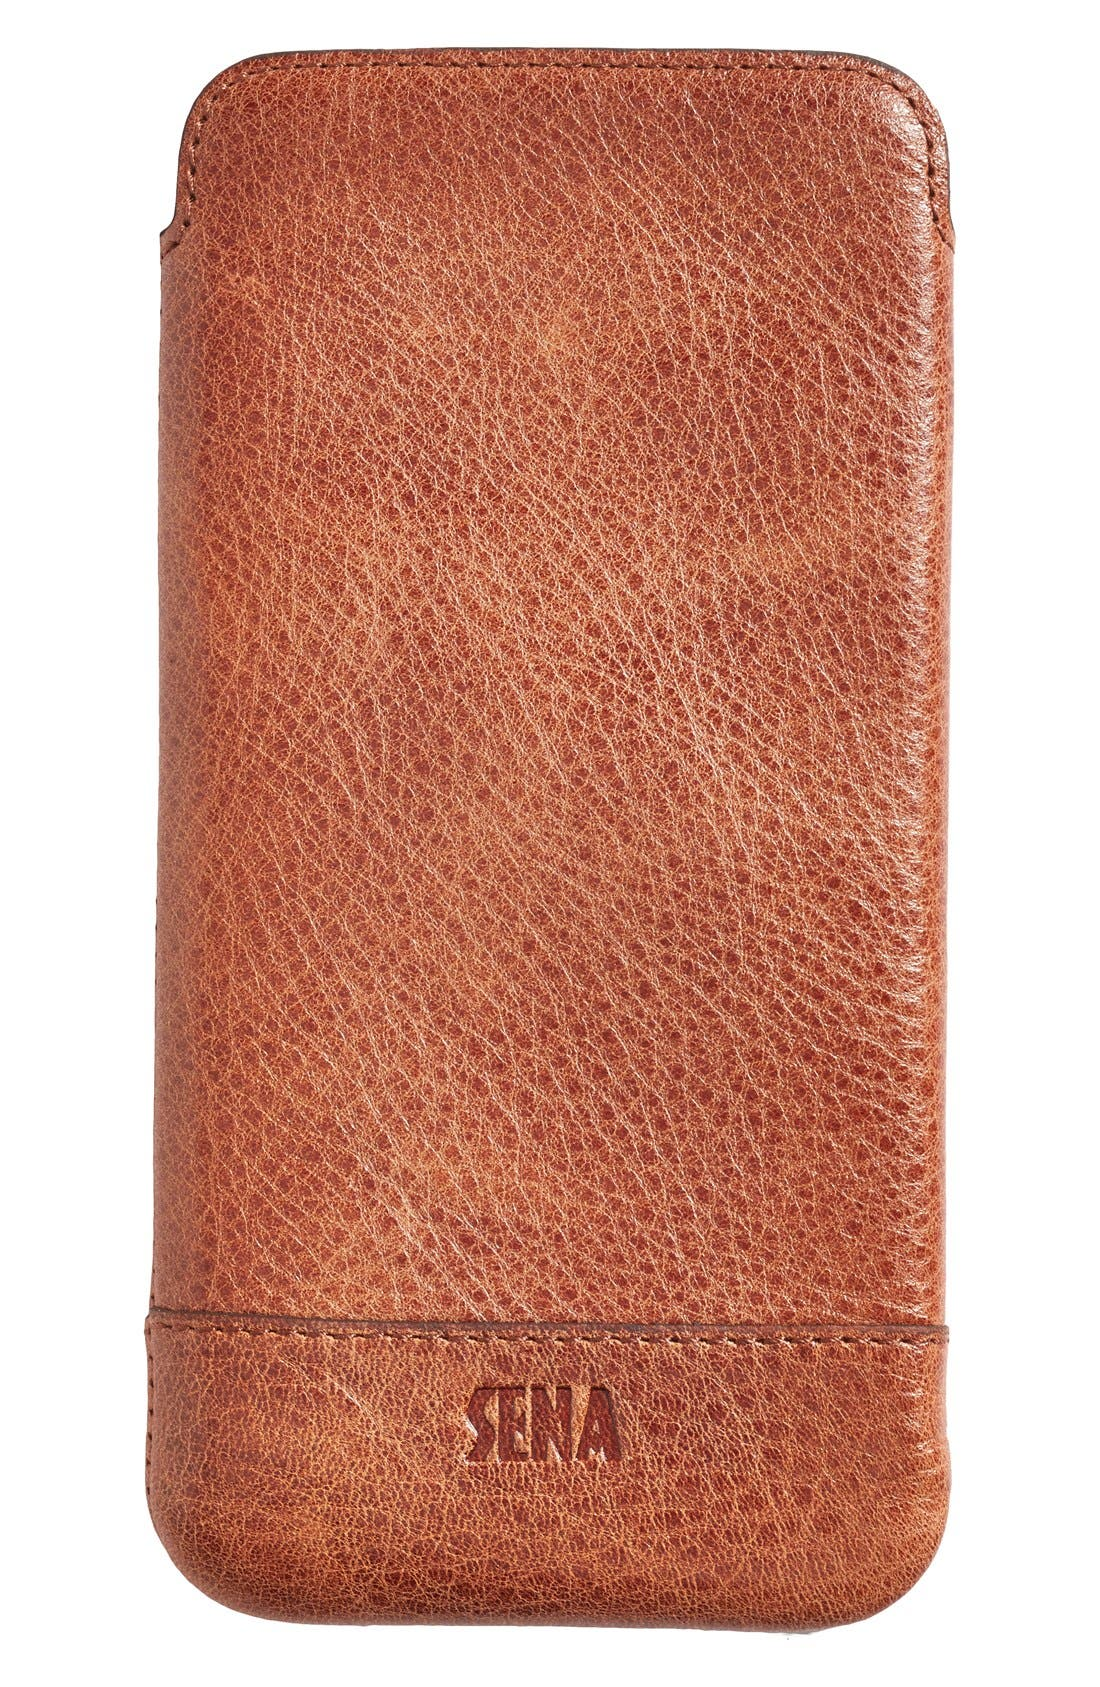 Sena Heritage - Ultra Slim Leather iPhone 6 Plus/6s Plus Pouch